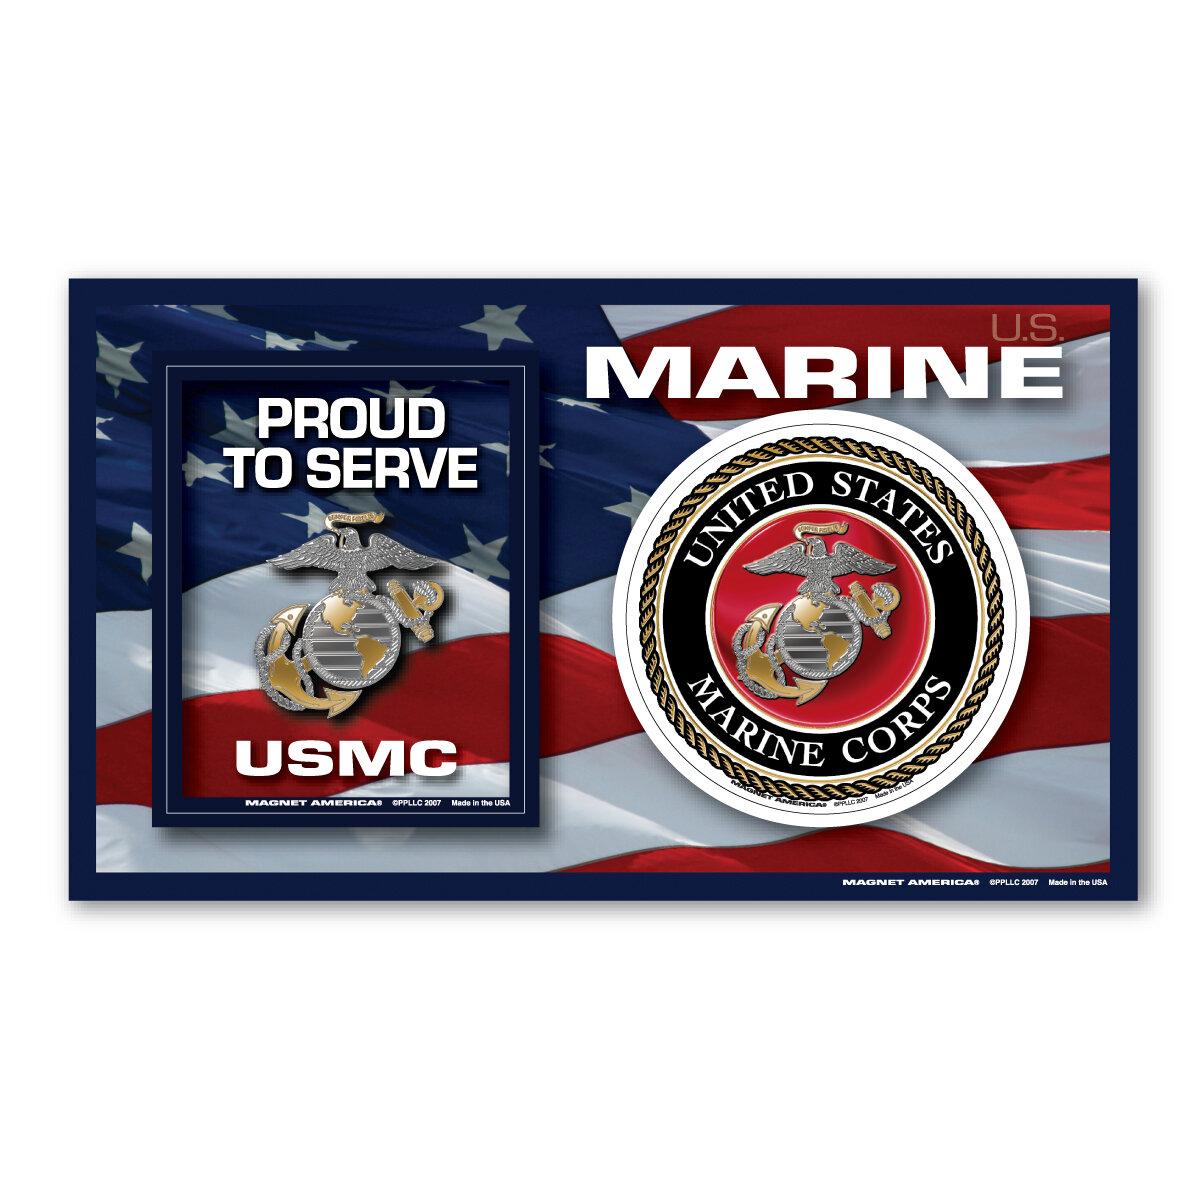 Magnet America Marine Magnet Picture Frame Wayfair